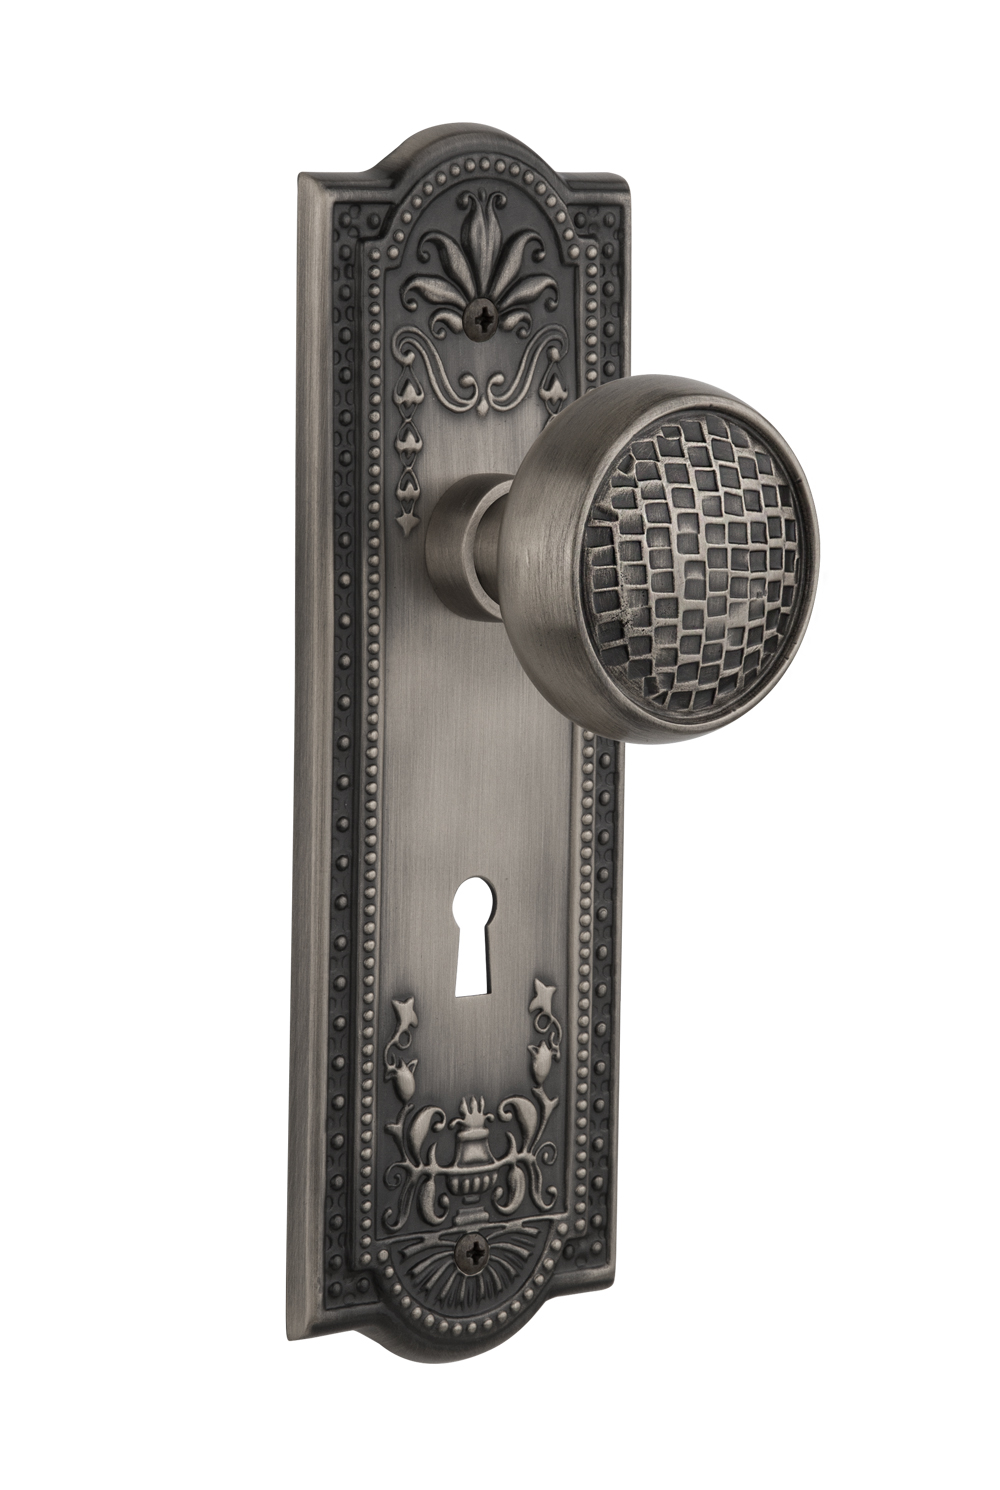 ANTIQUE COMPLETE POCKET DOOR HARDWARE SET MORTISE LOCKS 4 THICK BRASS PLATES